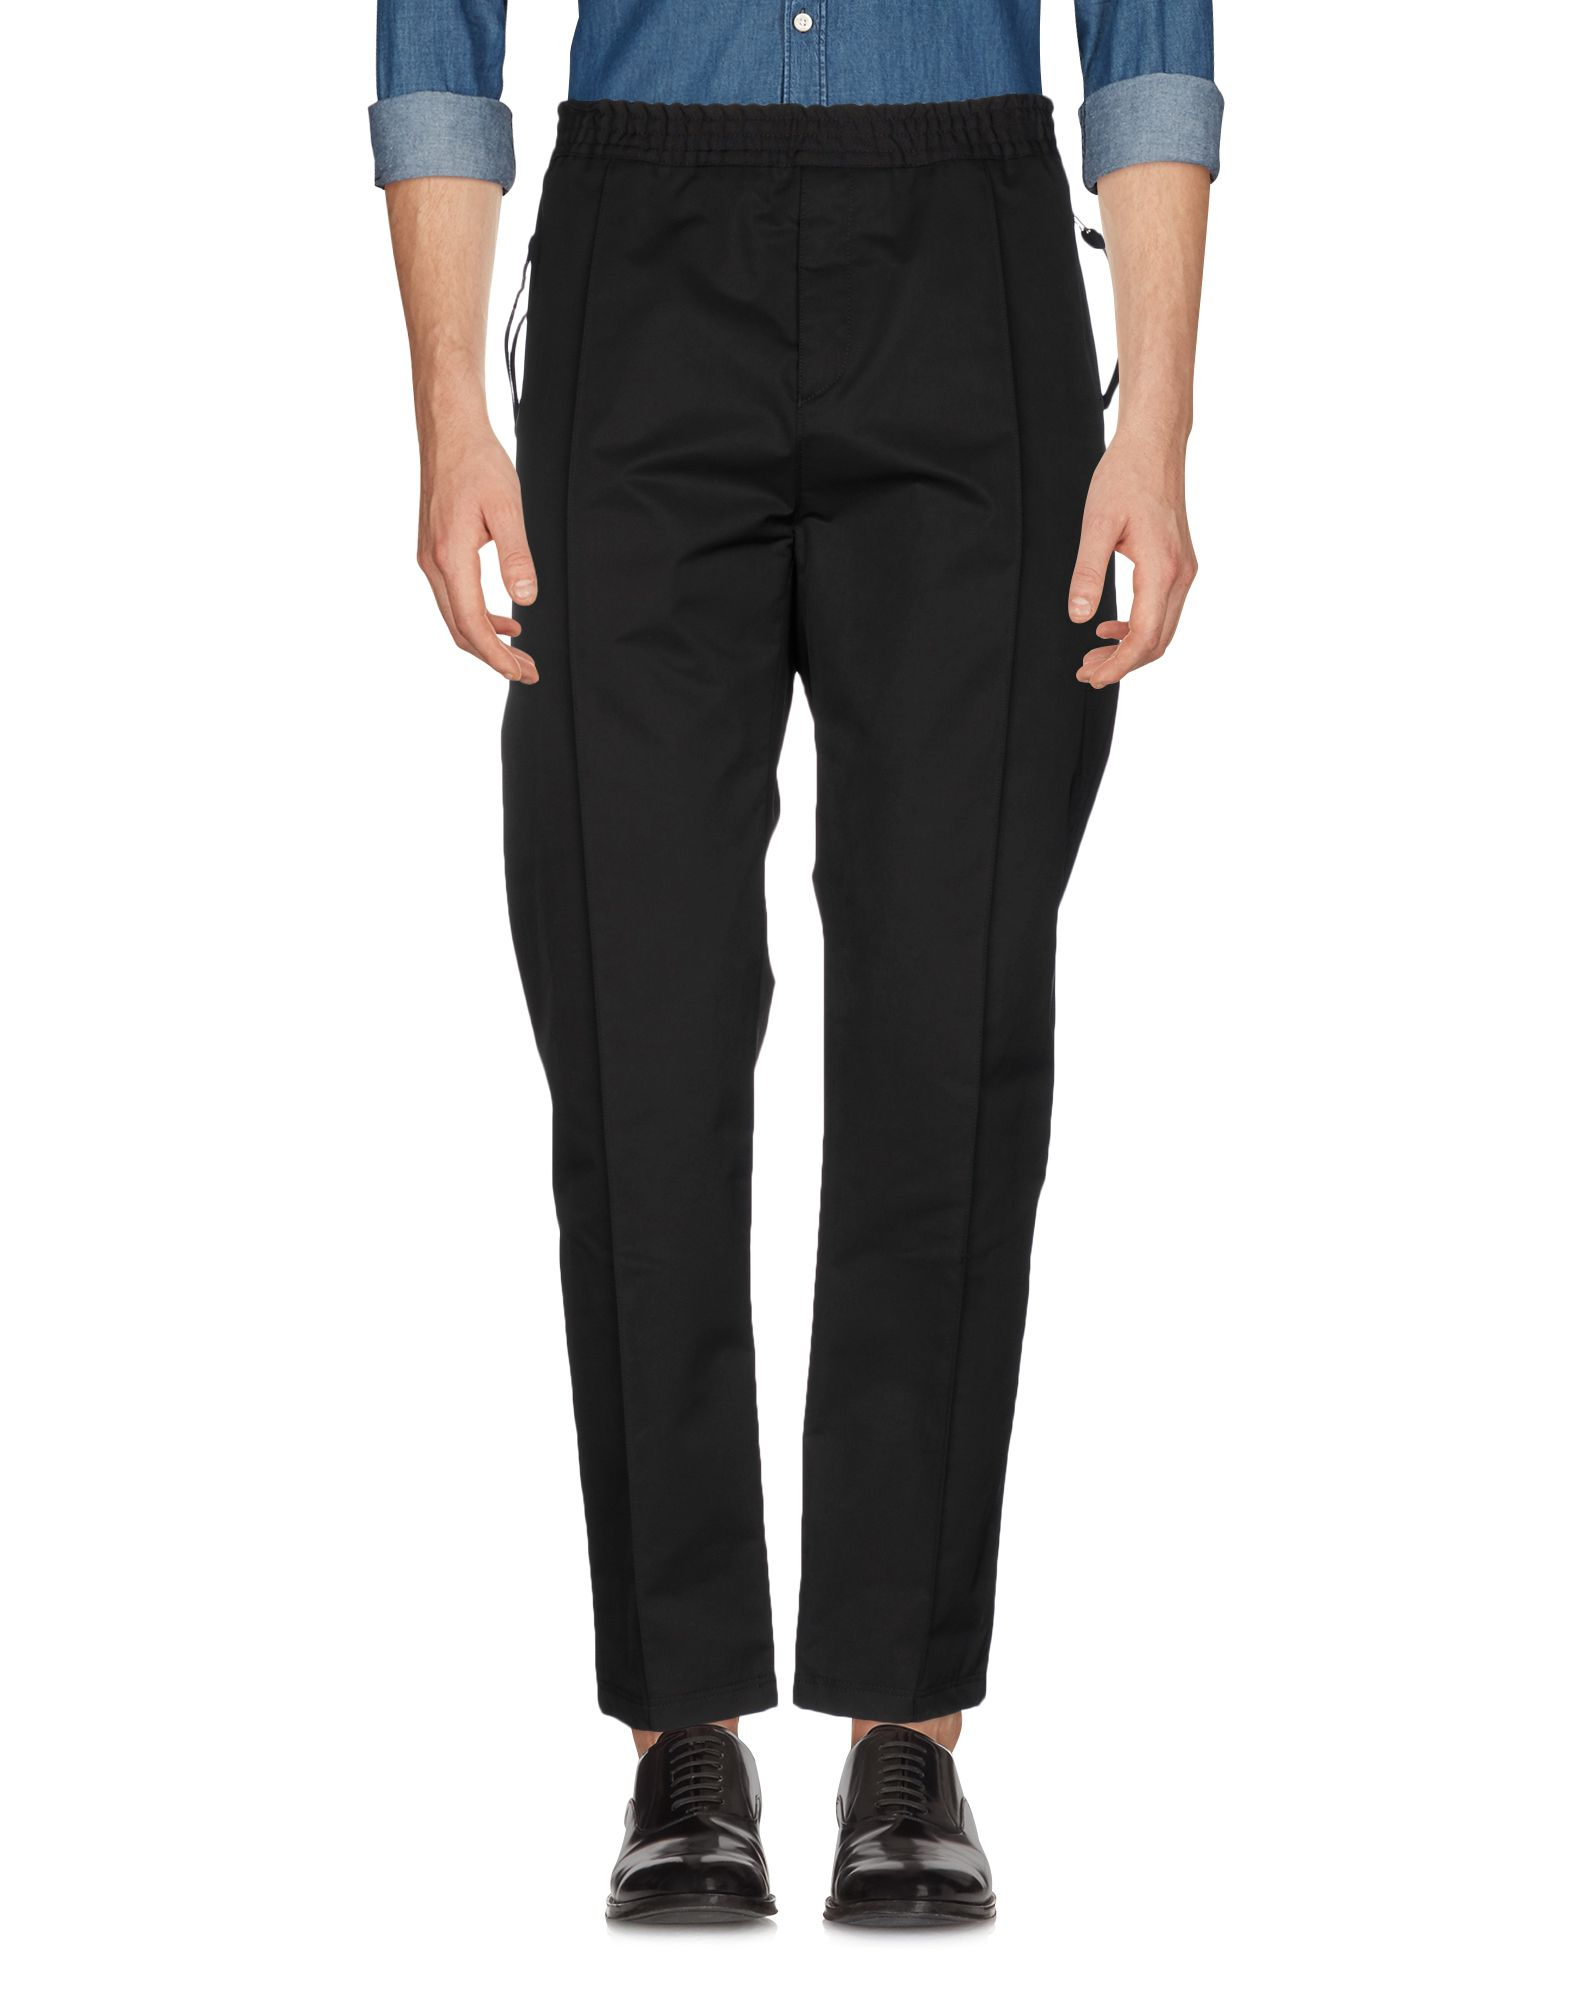 Pantalone Givenchy Uomo - Acquista online su